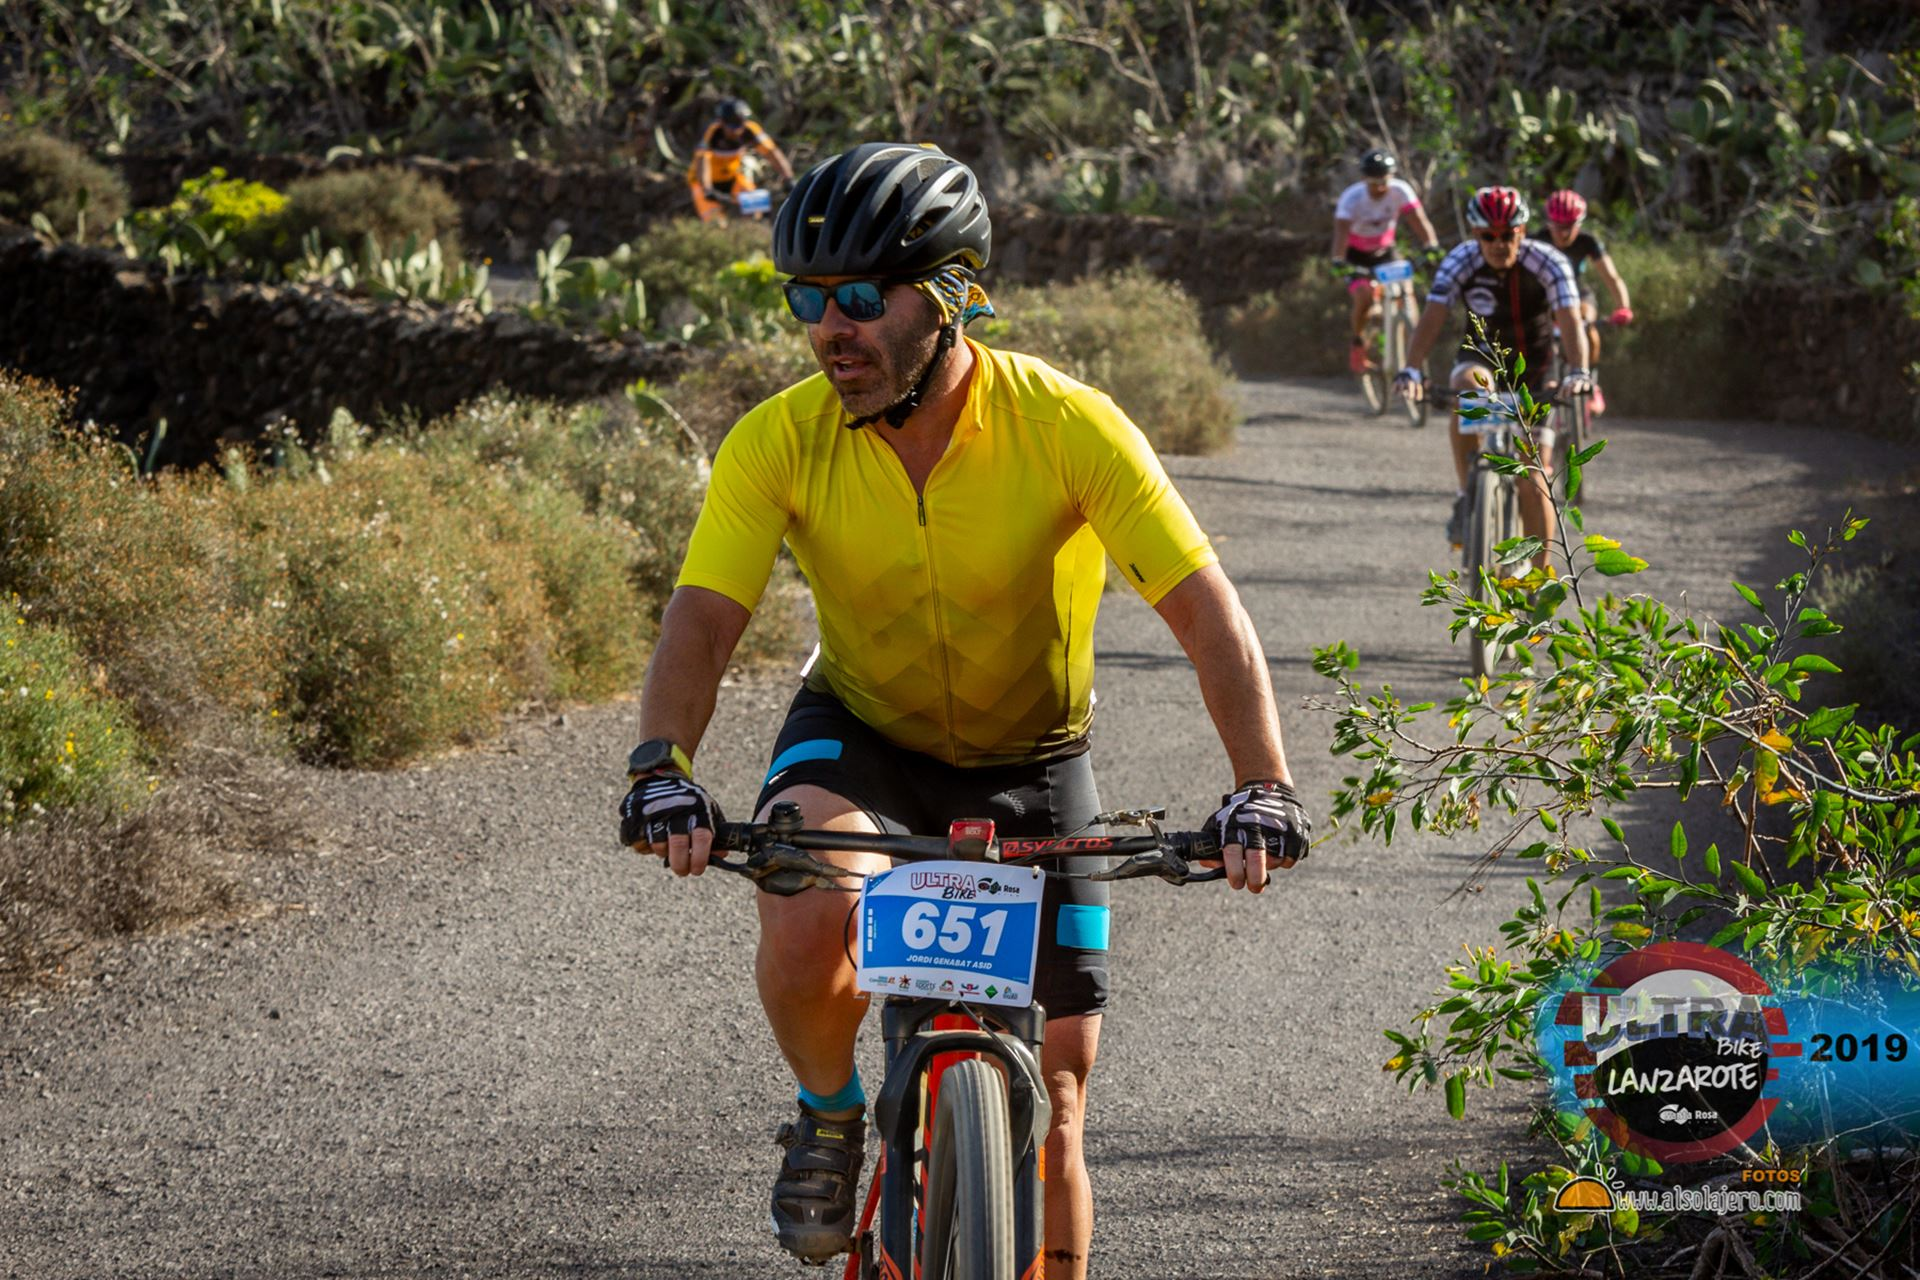 Sector Guatiza 2ª Etapa Ultrabike 2019 Fotos Alsolajero.com-165